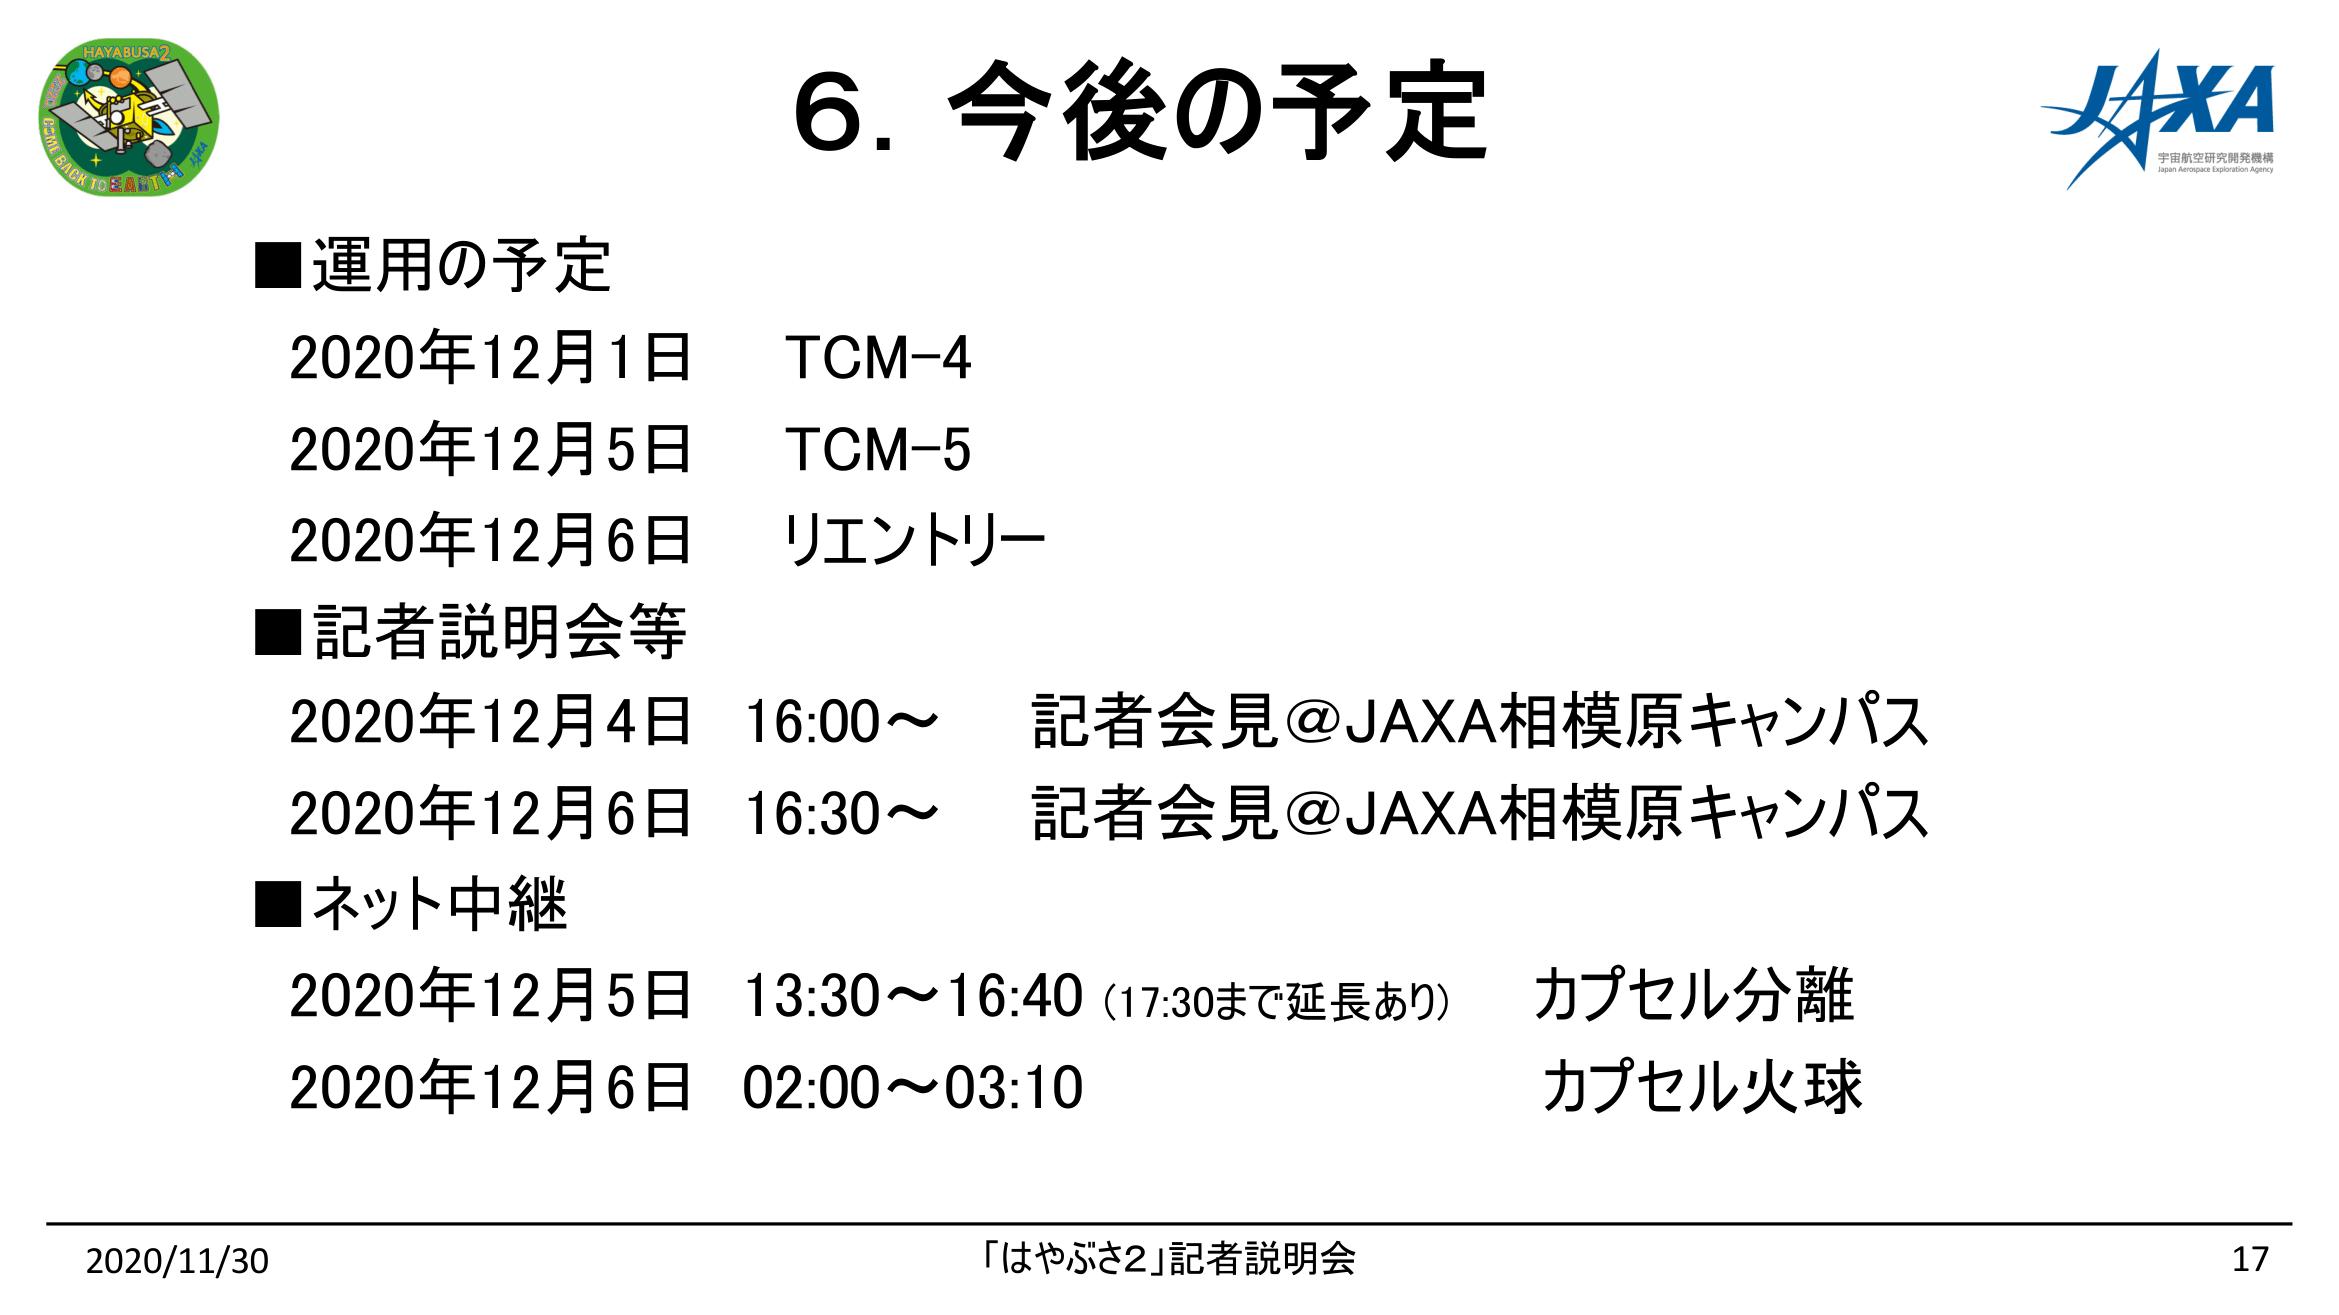 f:id:Imamura:20201130154218p:plain